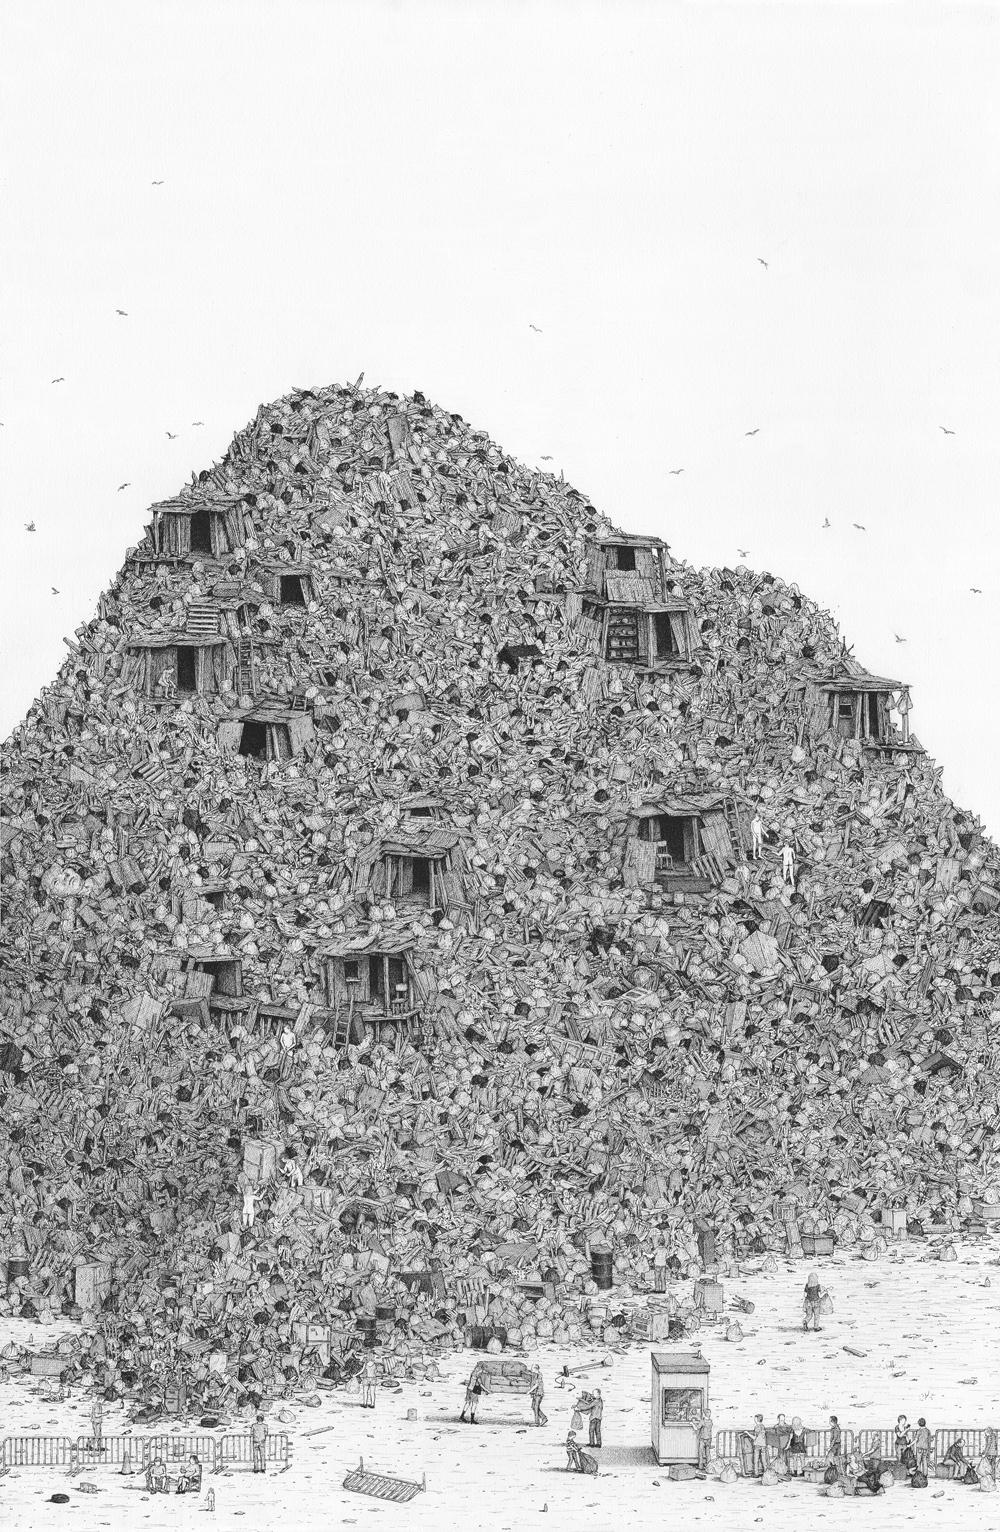 'Trash' - Ben Tolman